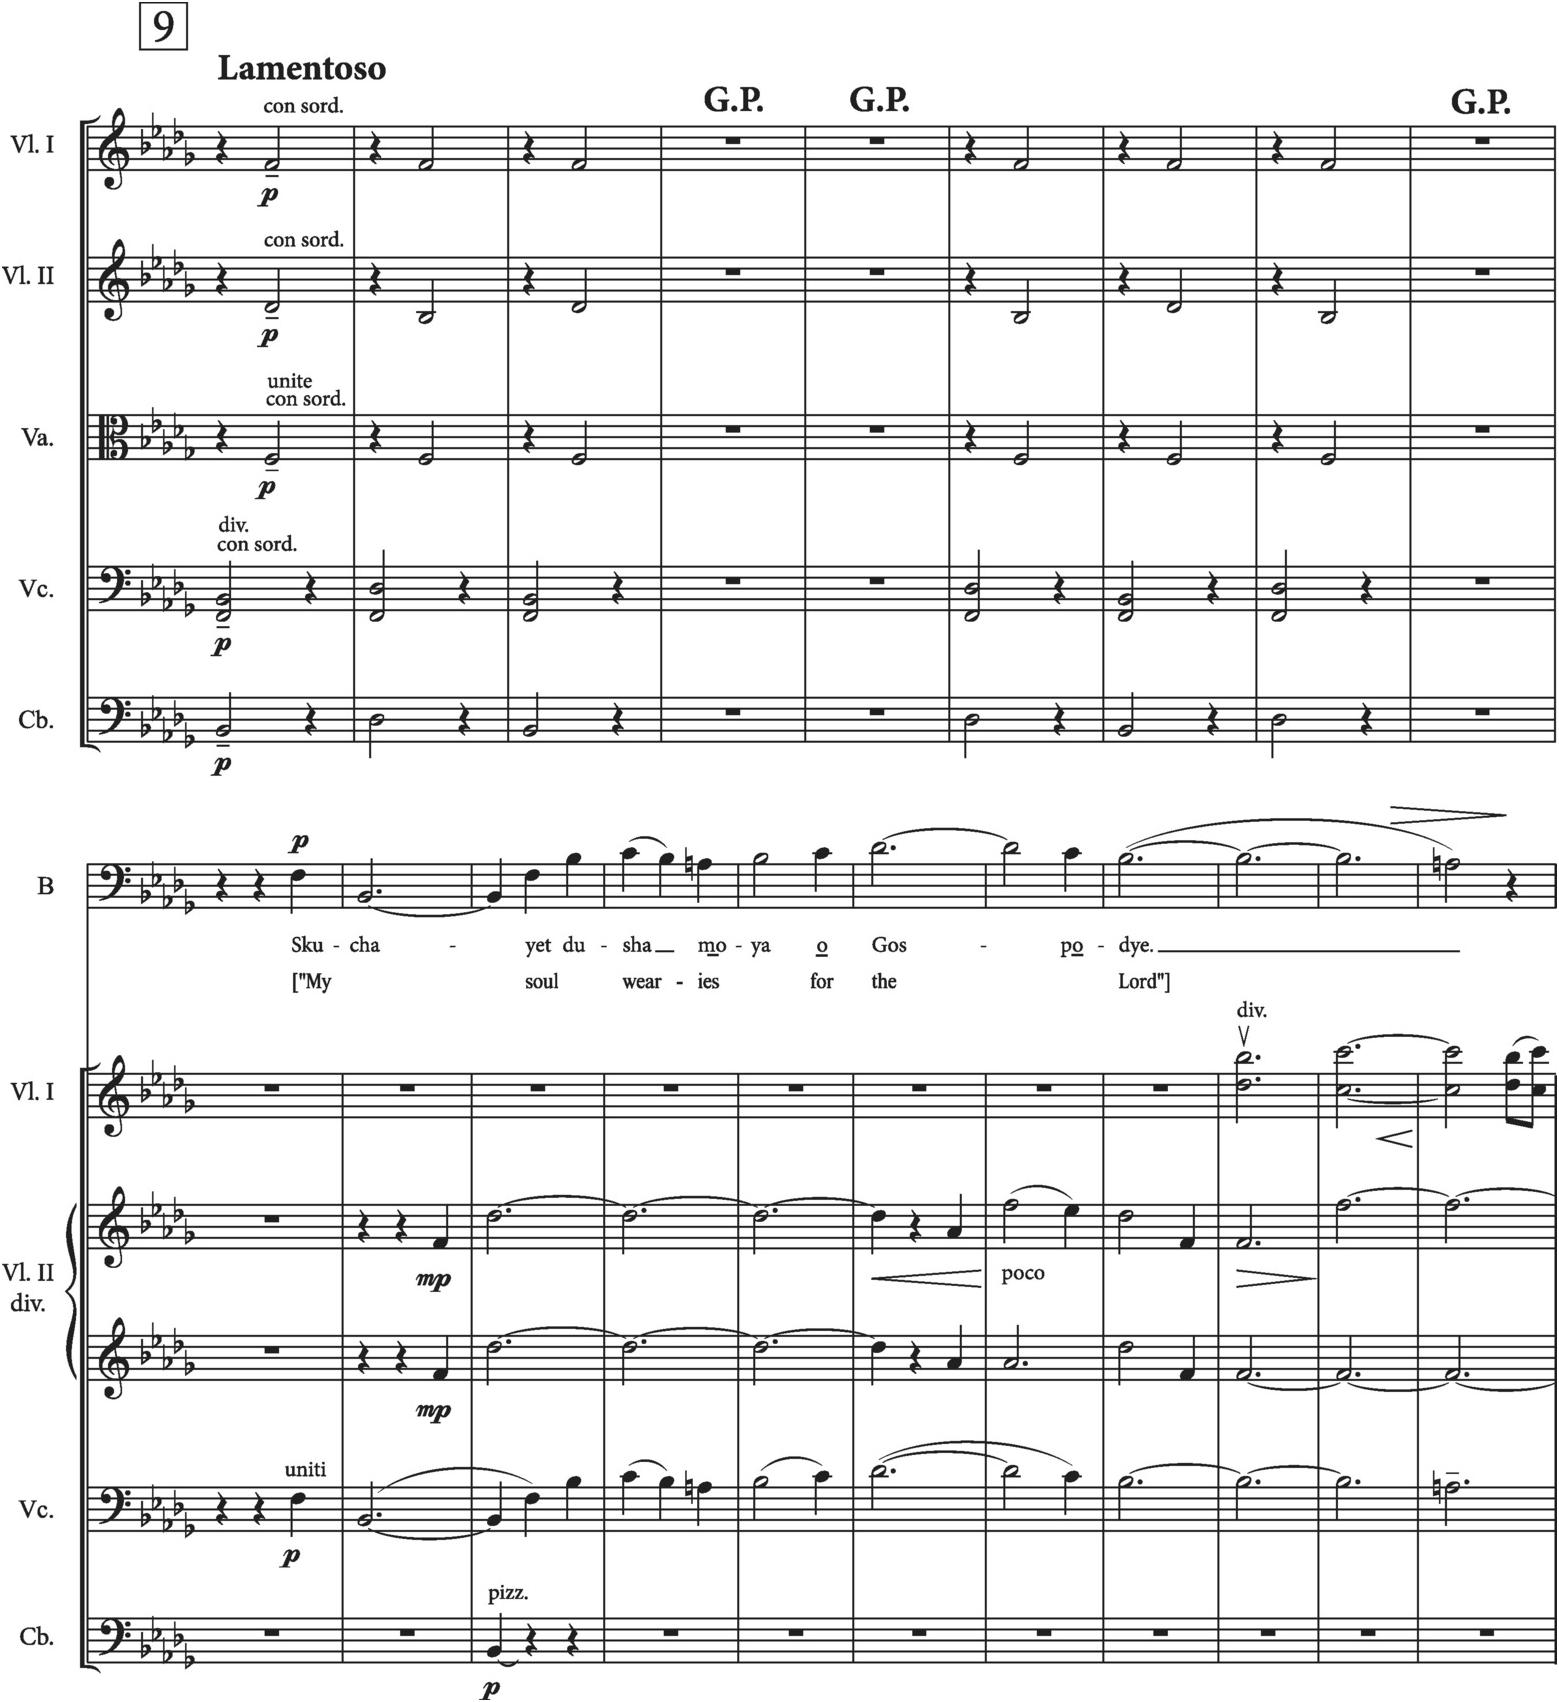 The Great Call : Satb Divisi Orch. German, English Language Edition from Symphony No. 2 Chorus Parts /& Piano